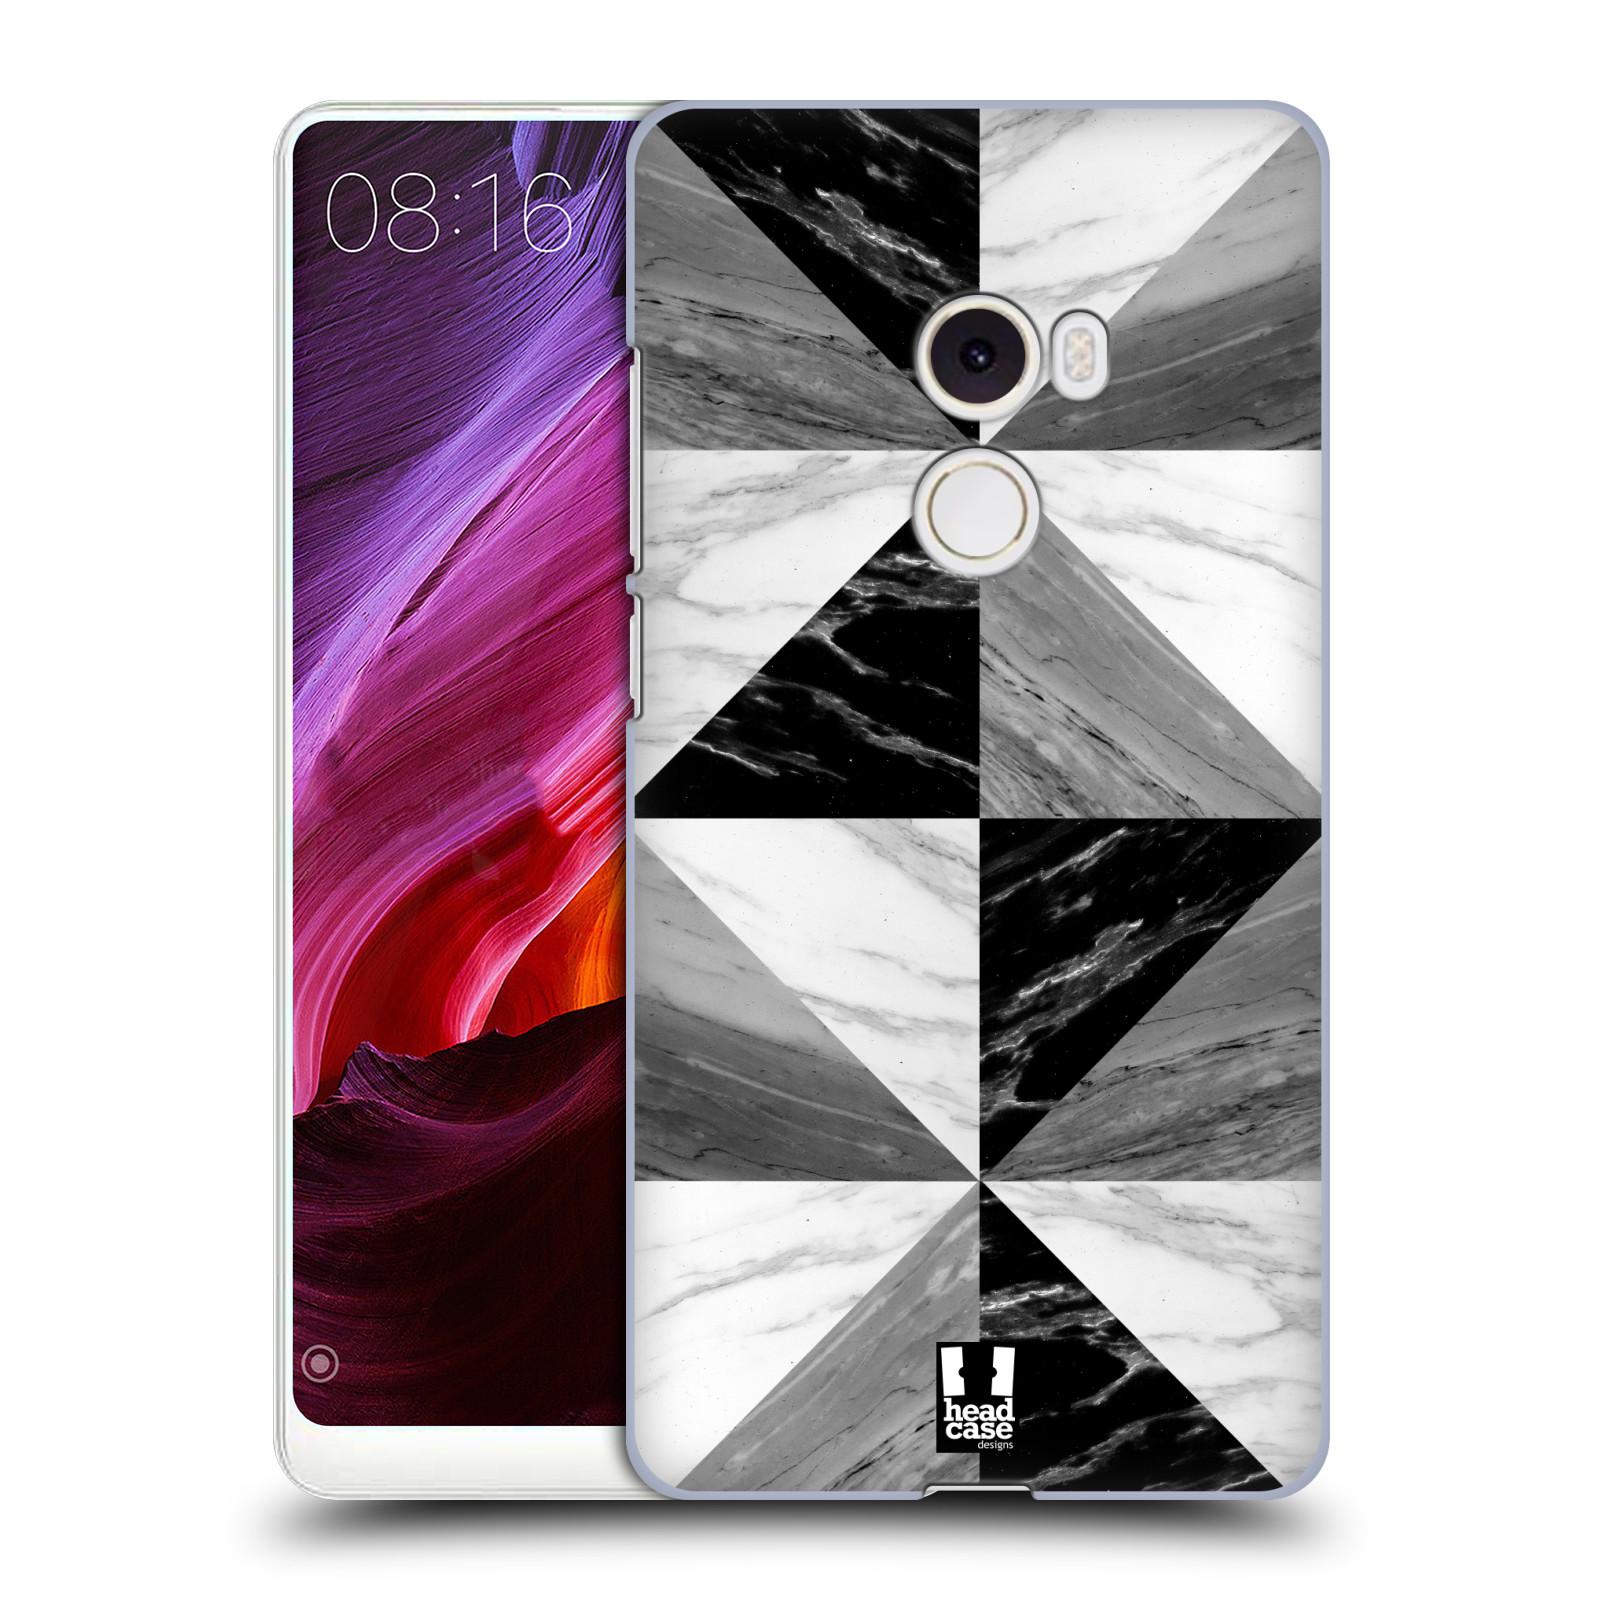 Plastové pouzdro na mobil Xiaomi Mi Mix 2 - Head Case - Mramor triangl